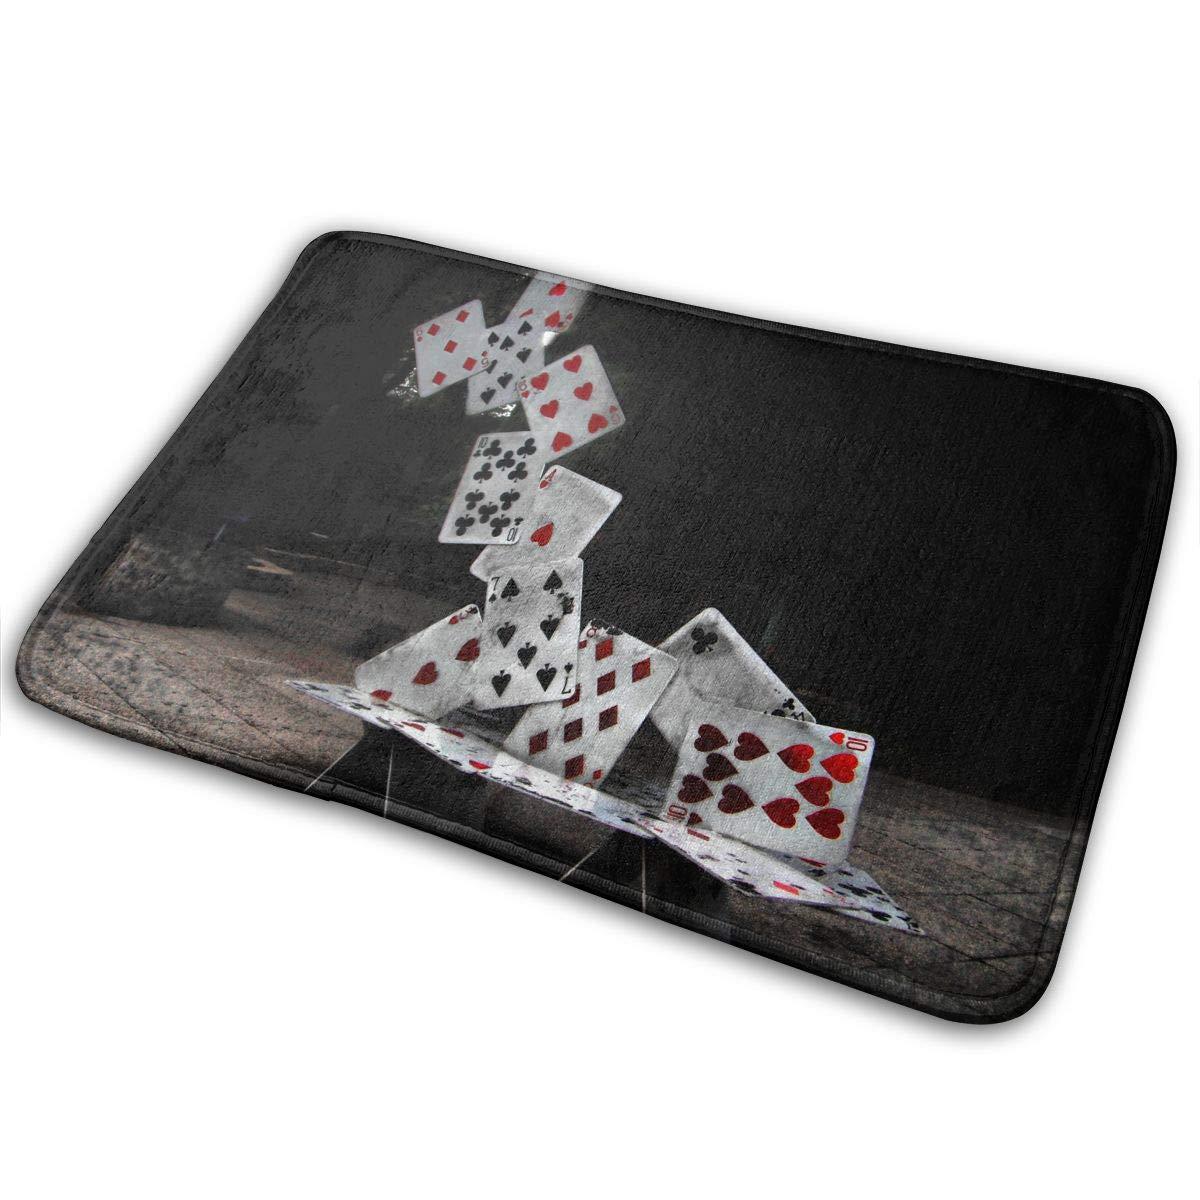 JTLCBC Abstract Castle of Cards Poker Entry Way Outdoor Door Mat Bathroom Comfort Mats Rubber Non Slip Backing Indoor Uses